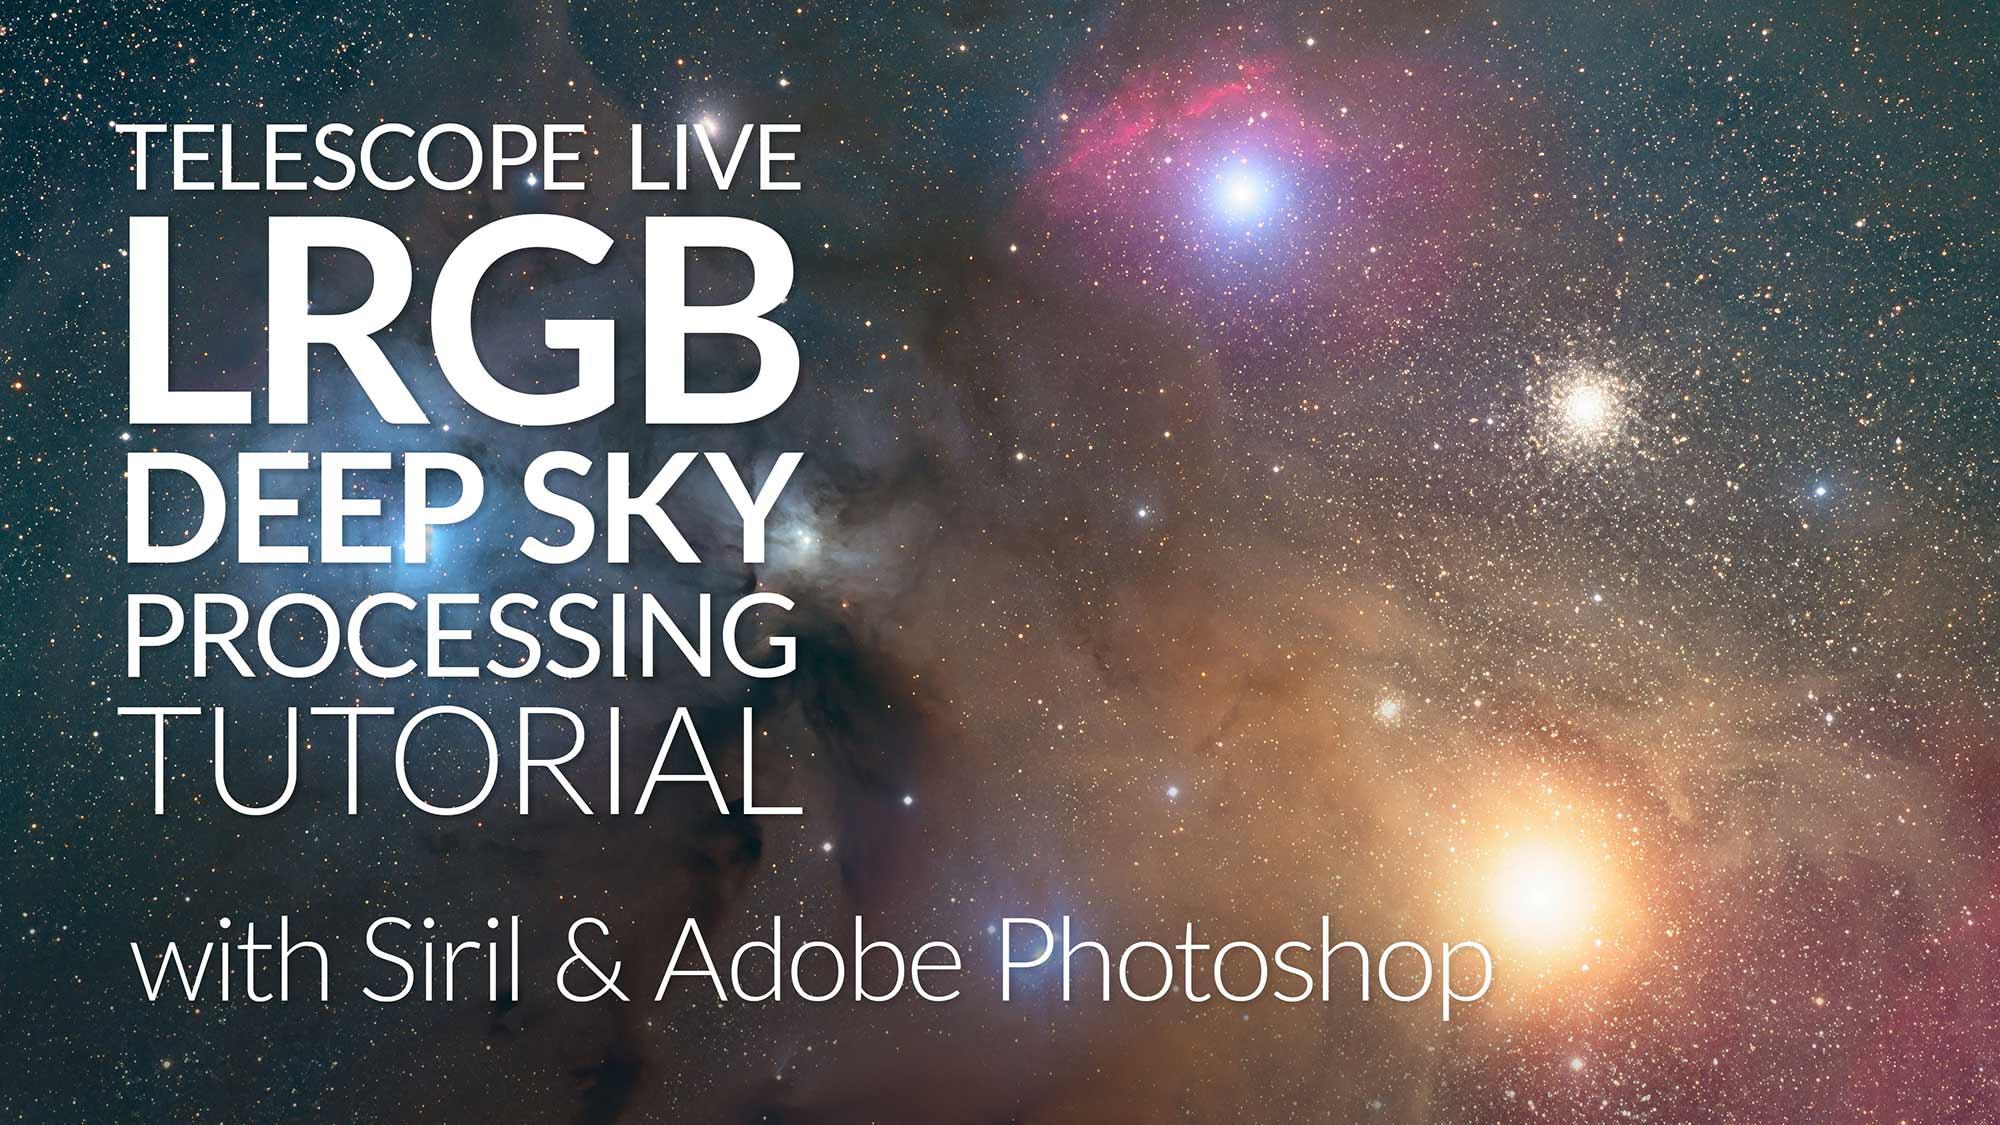 Telescope Live LRGB Deep Sky Processing Tutorial with Siril & Adobe Photoshop